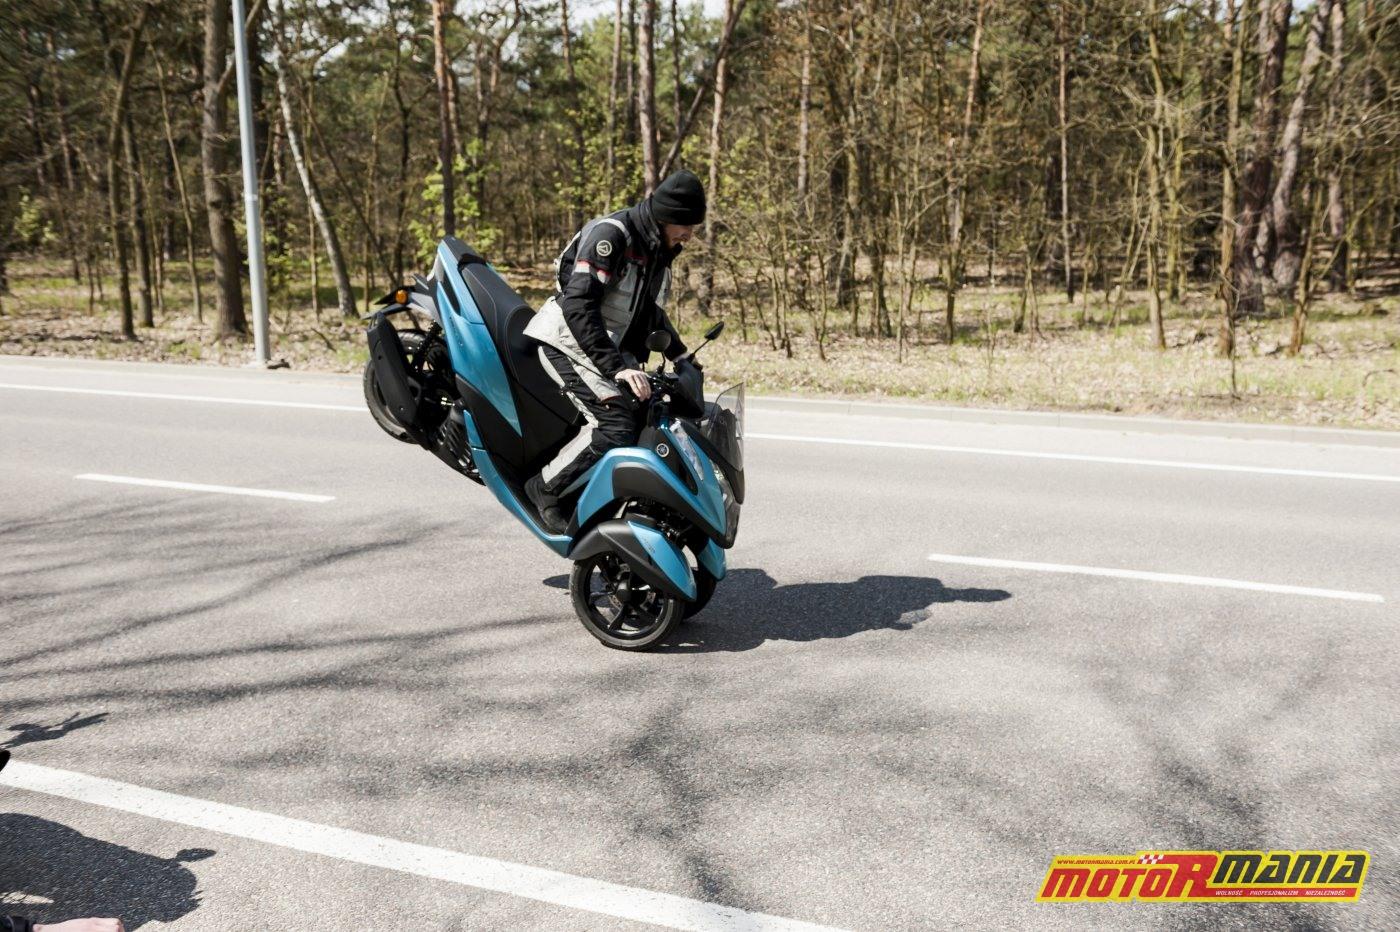 Yamaha Tricity 125 test motormania - fot Tomazi_pl (14)